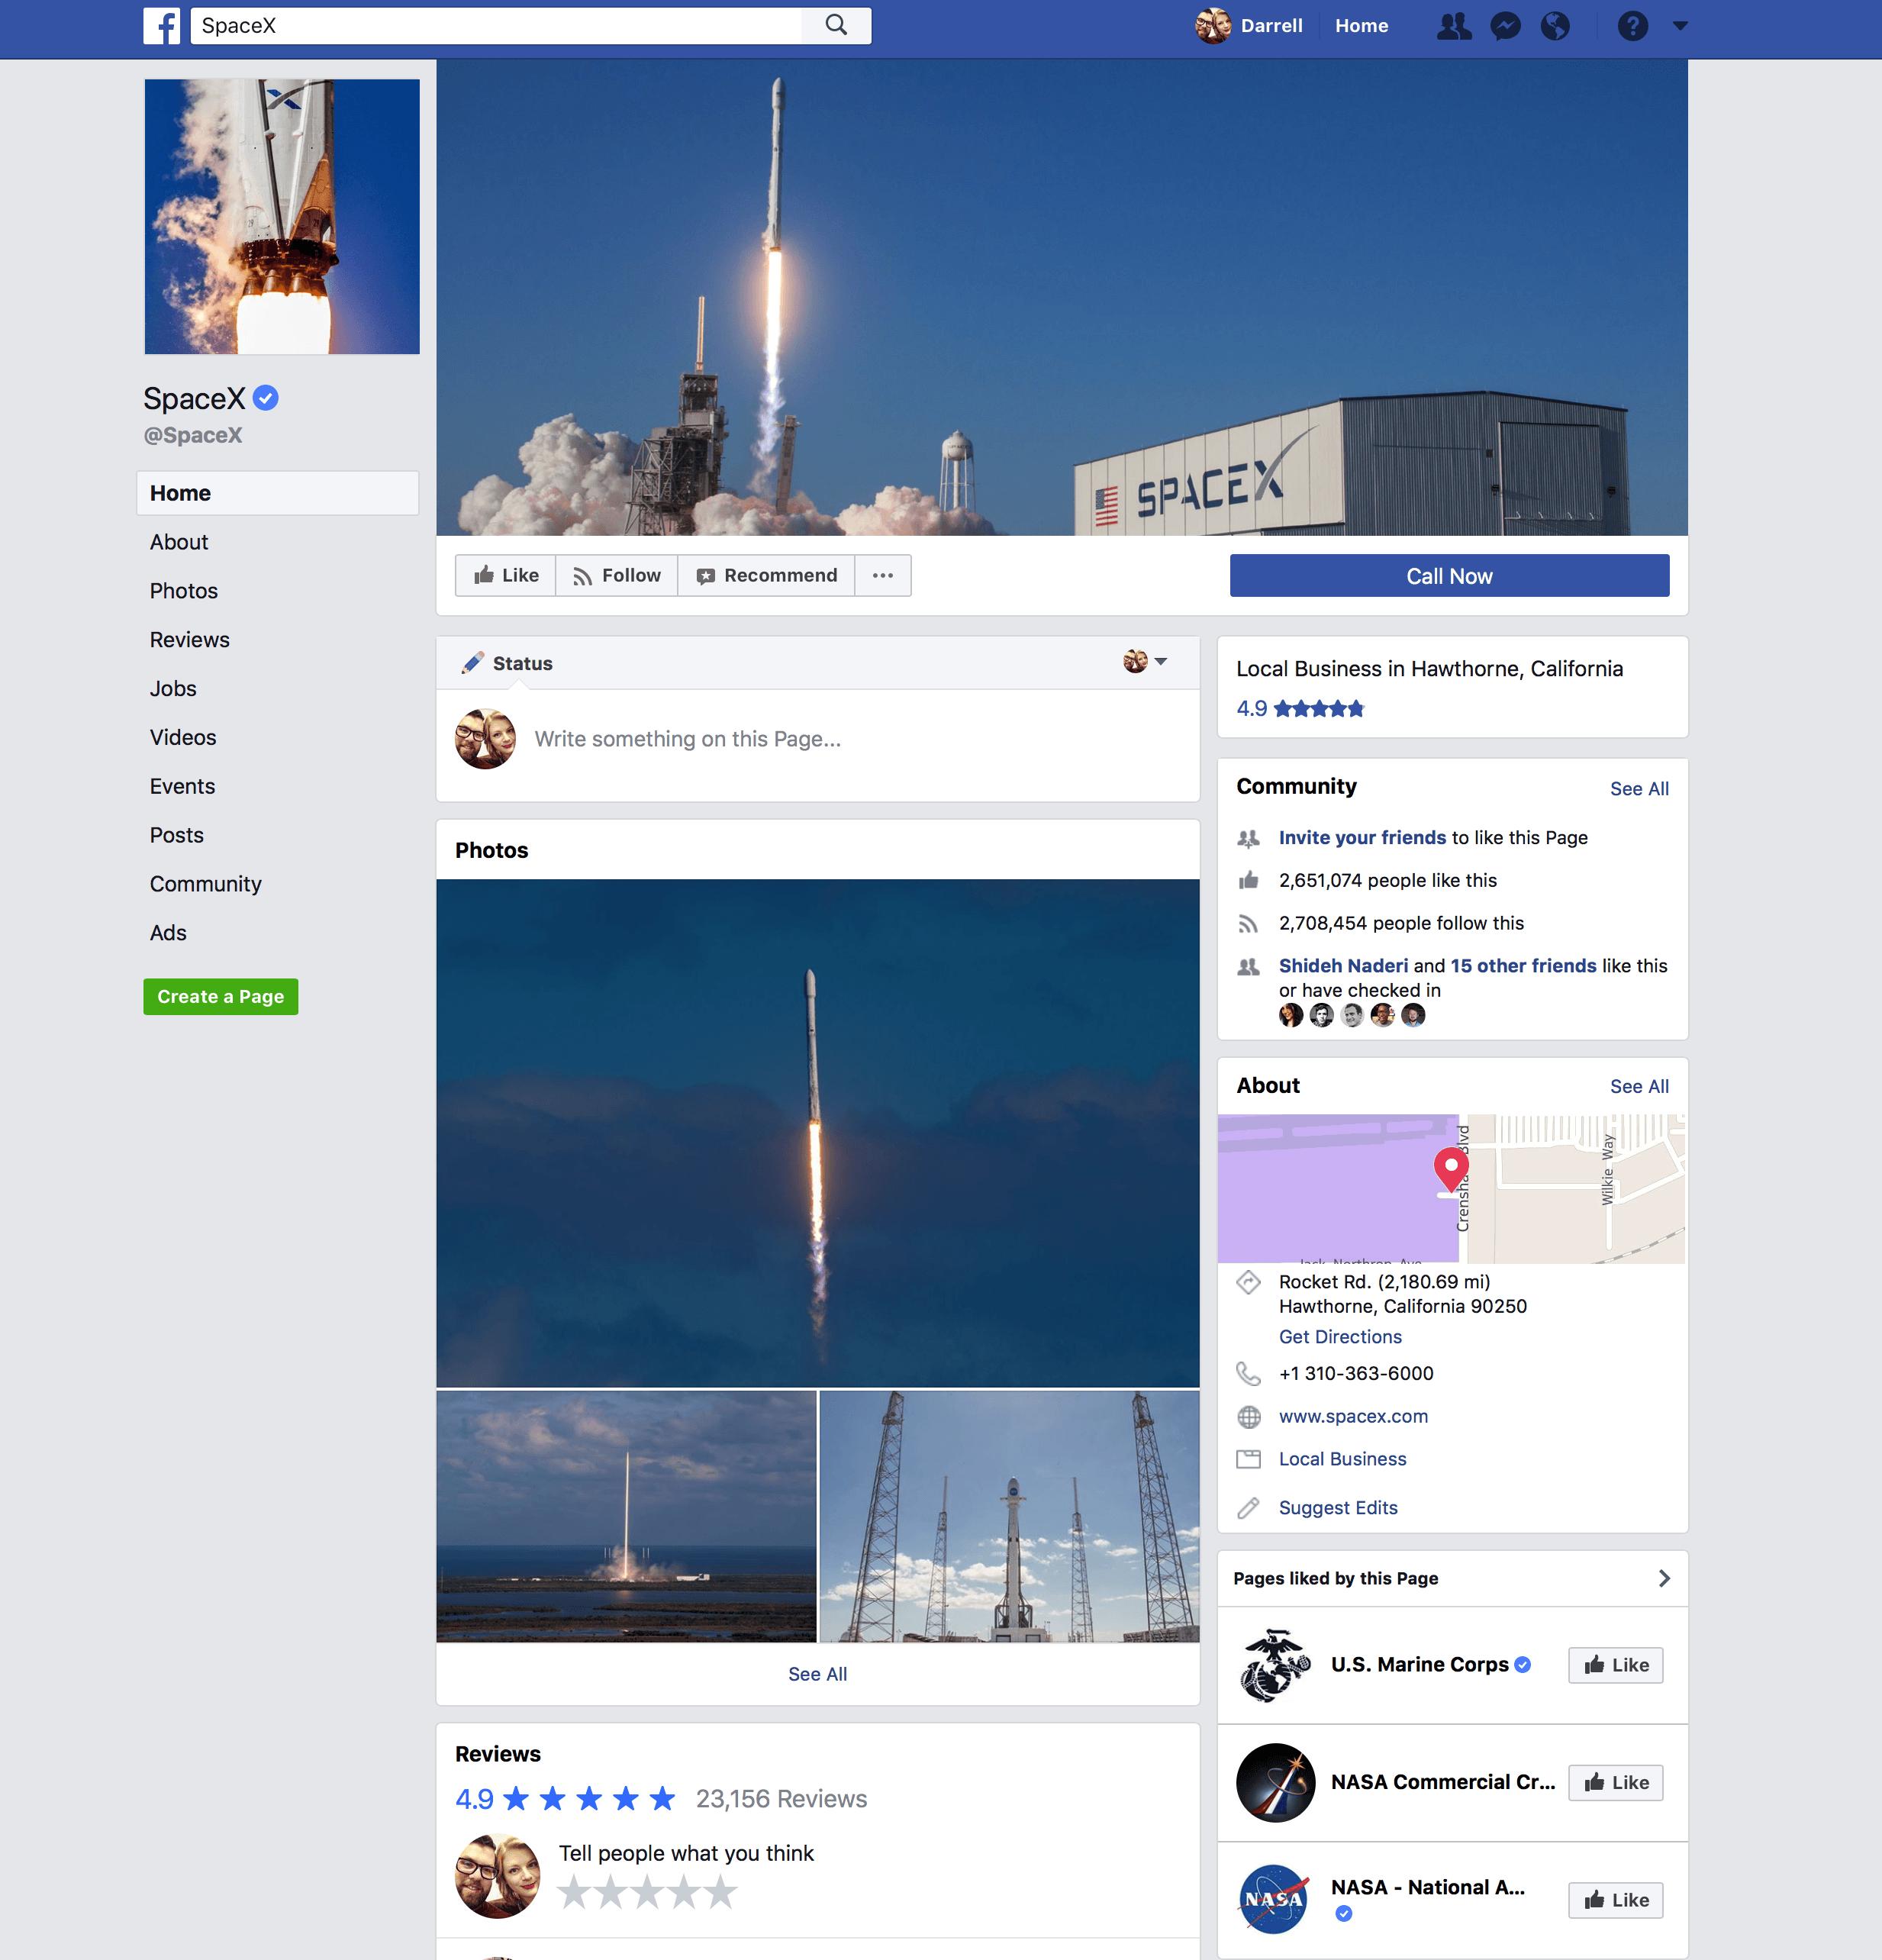 Elon Musk deletes